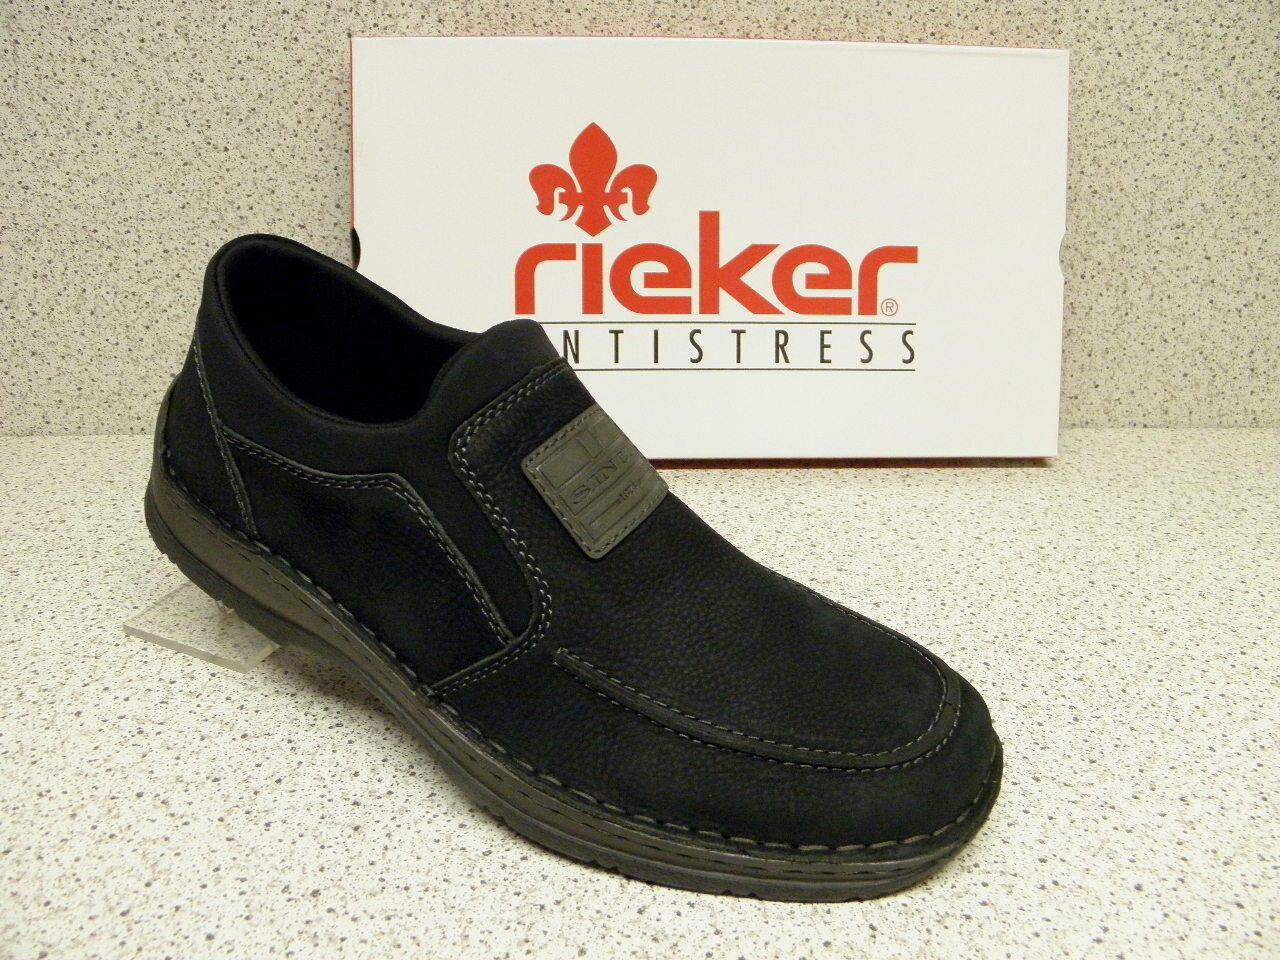 rieker ® bisher 64,95  Top Preis weit + gratis Premium - Socken (R380)